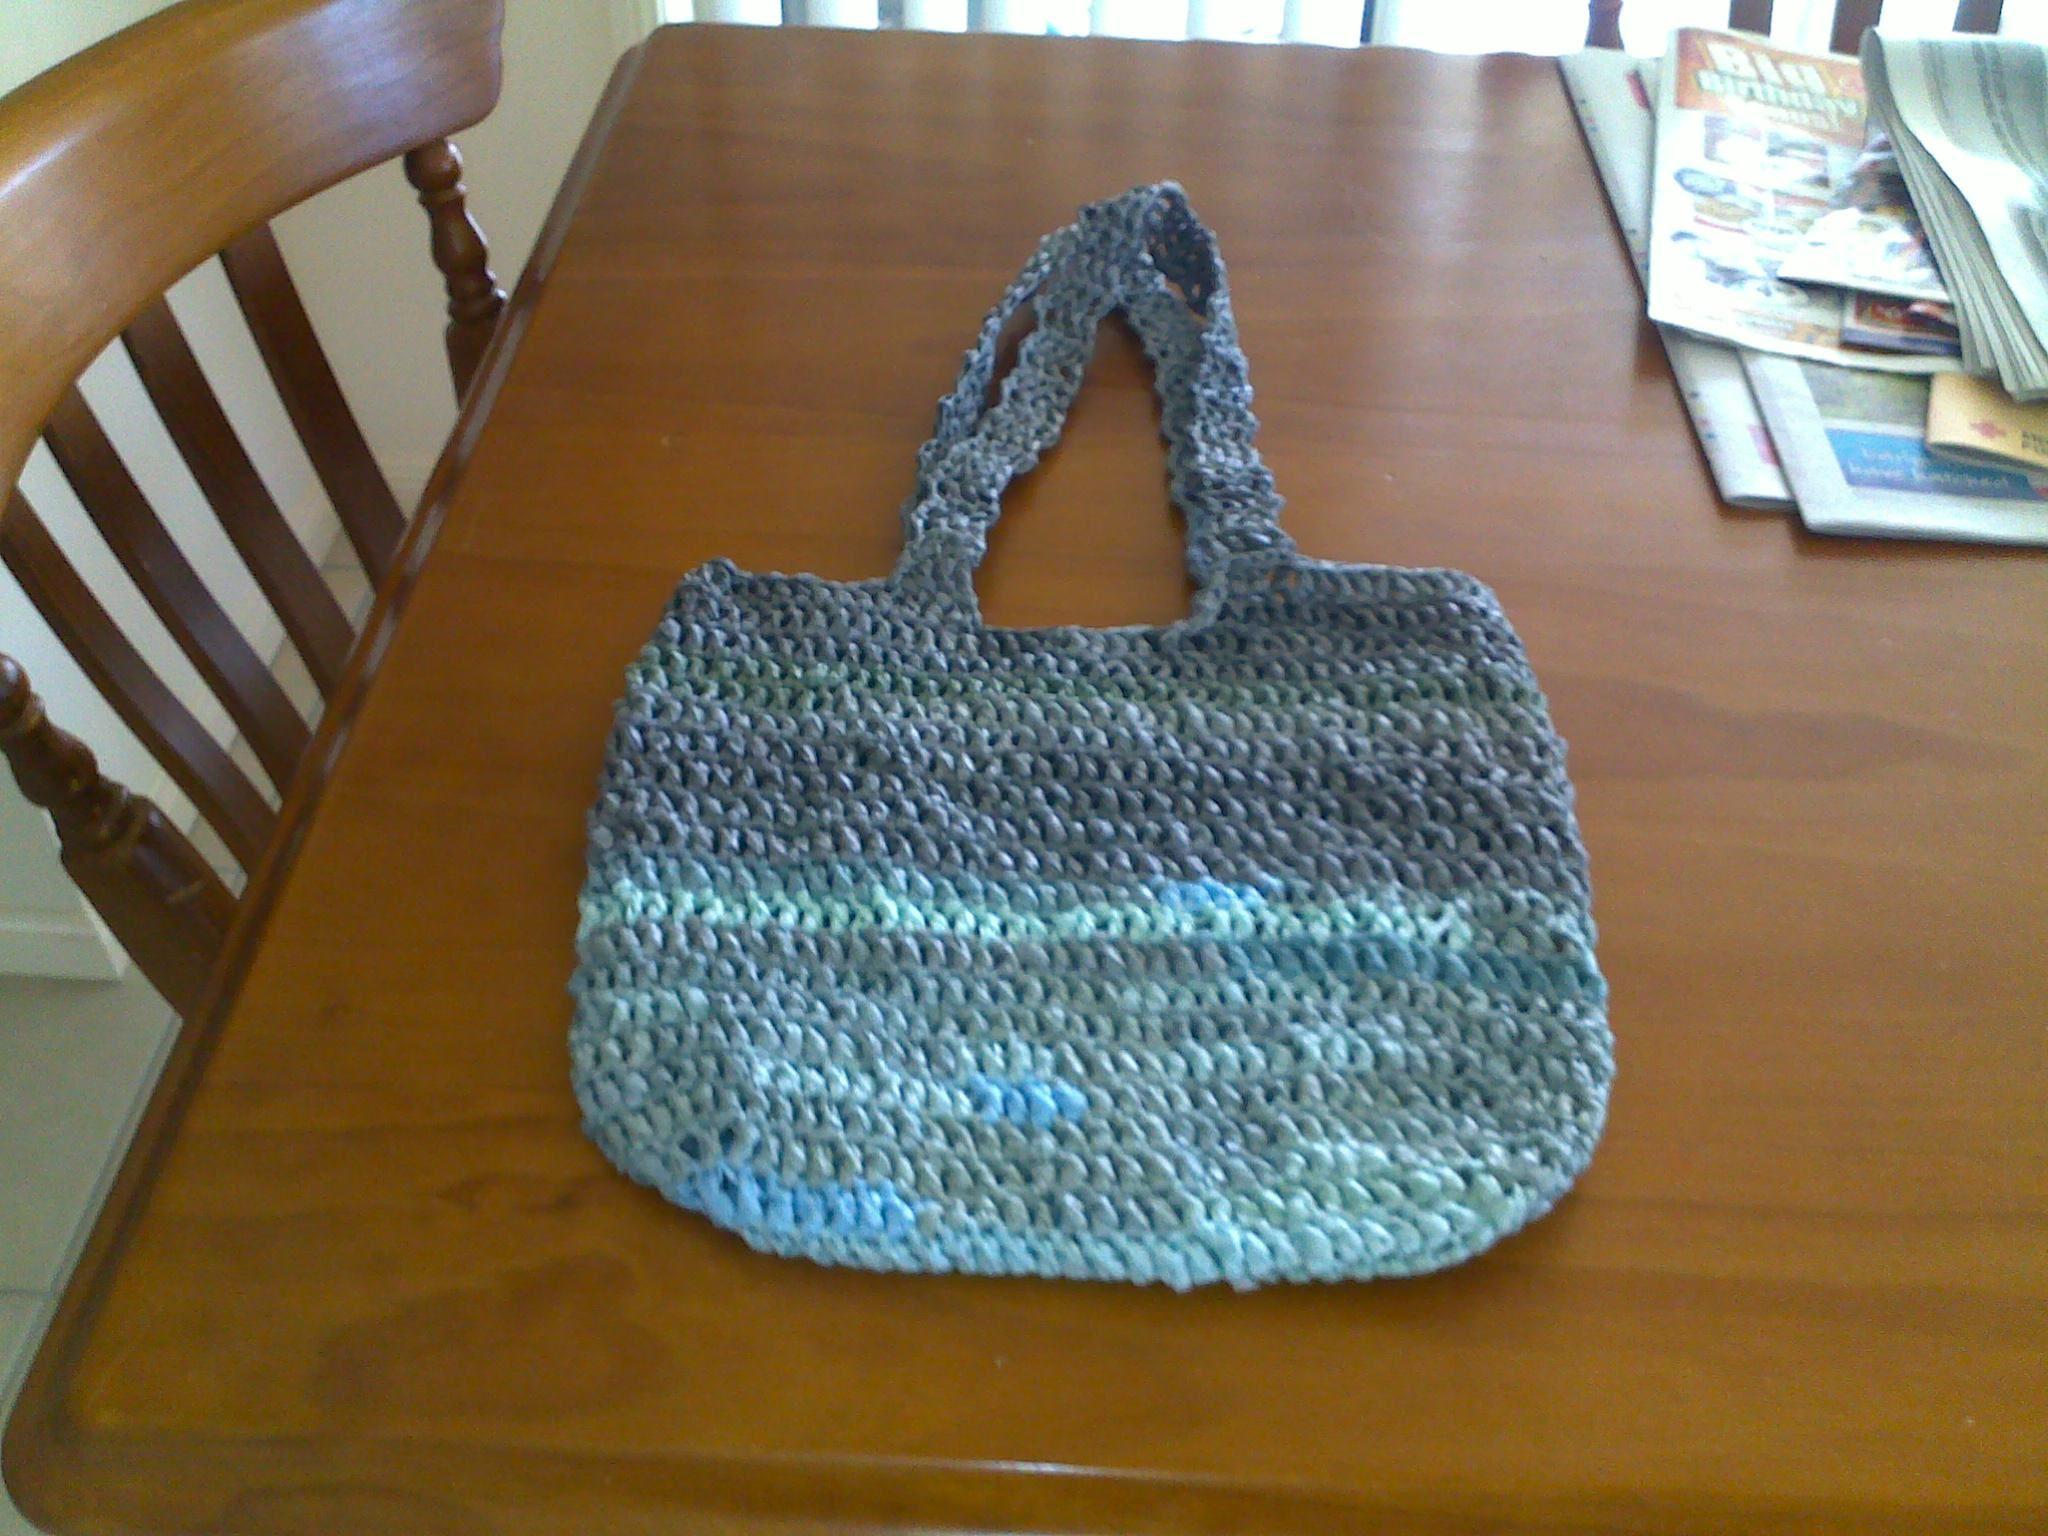 bag crochet from recycled shopping bags crochet patterns Pinterest